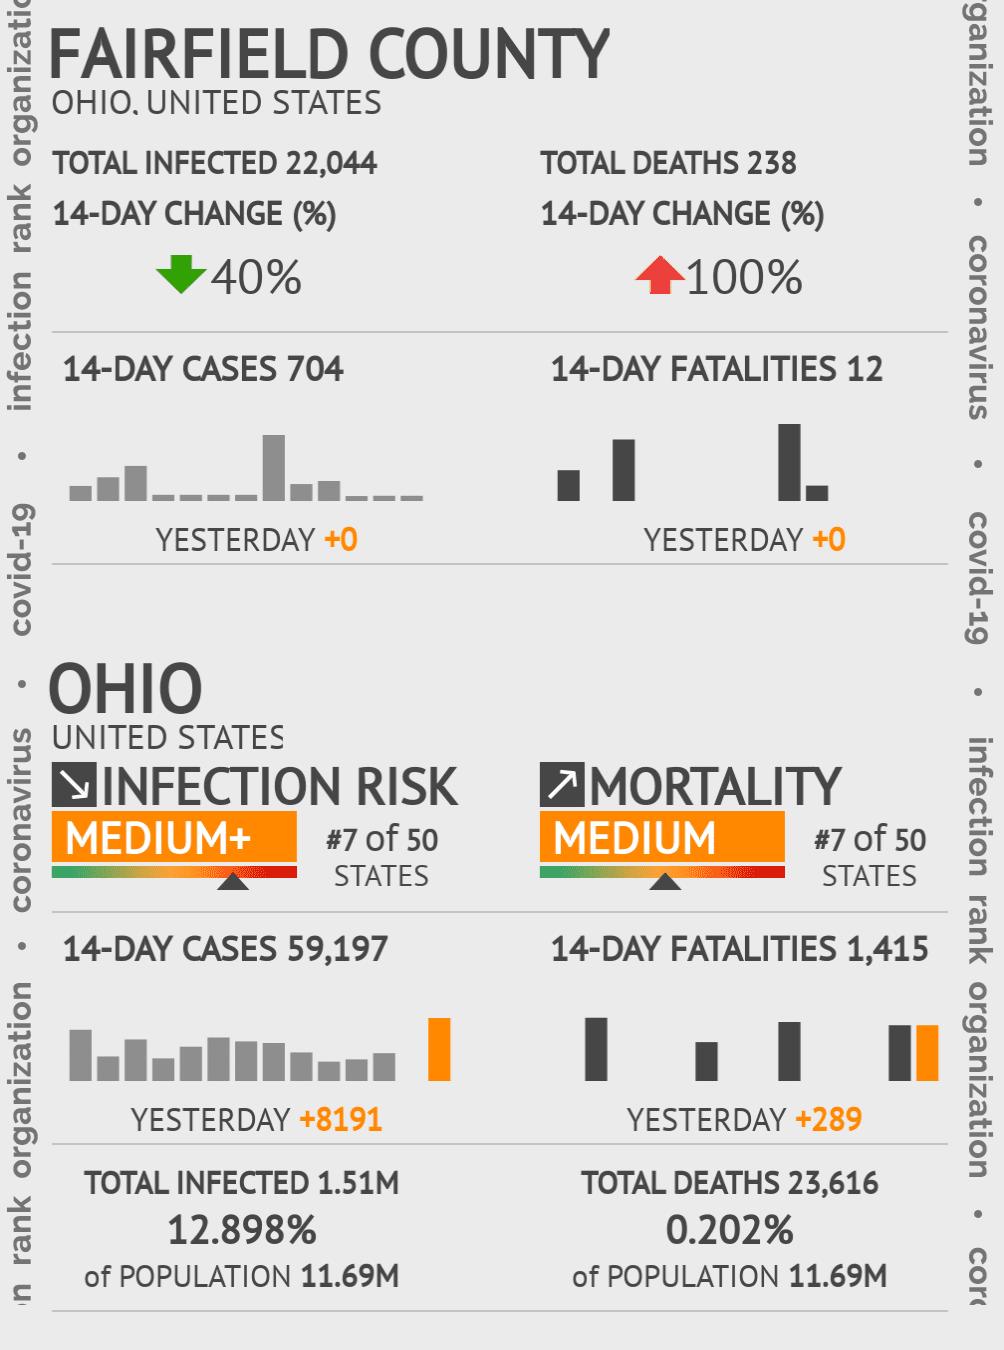 Fairfield County Coronavirus Covid-19 Risk of Infection on November 29, 2020